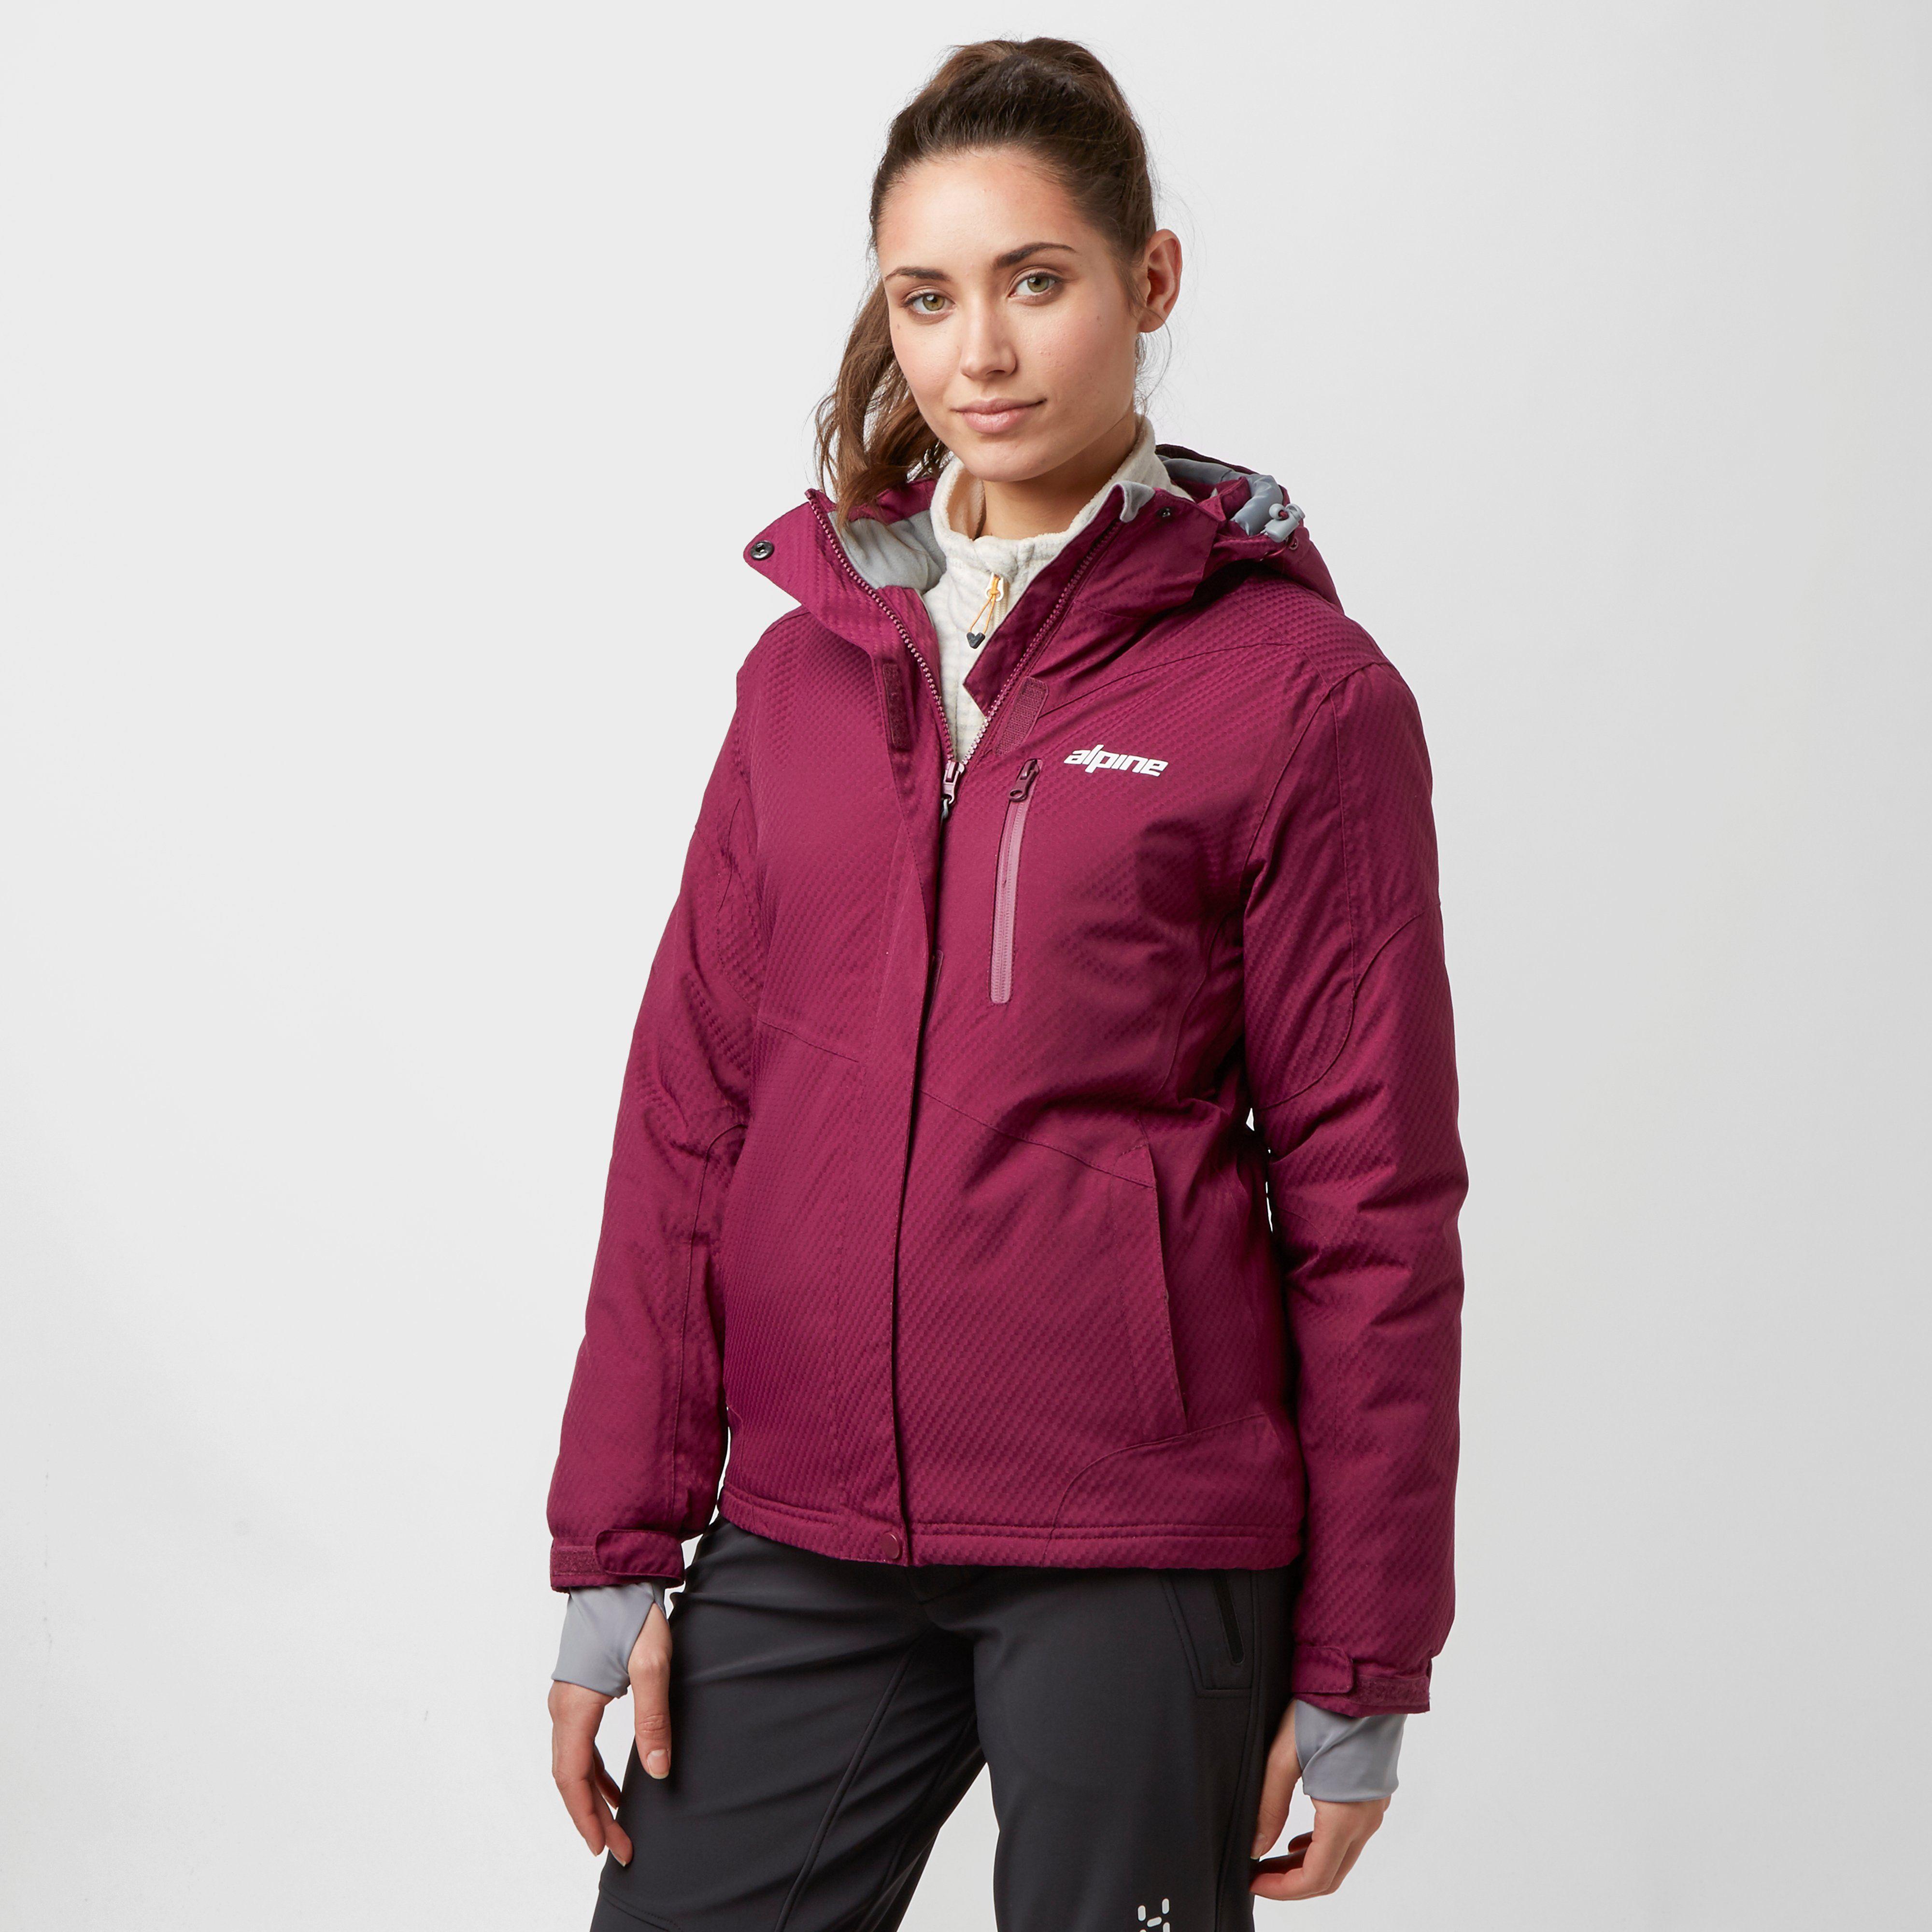 ALPINE Women's Morzine Jacket